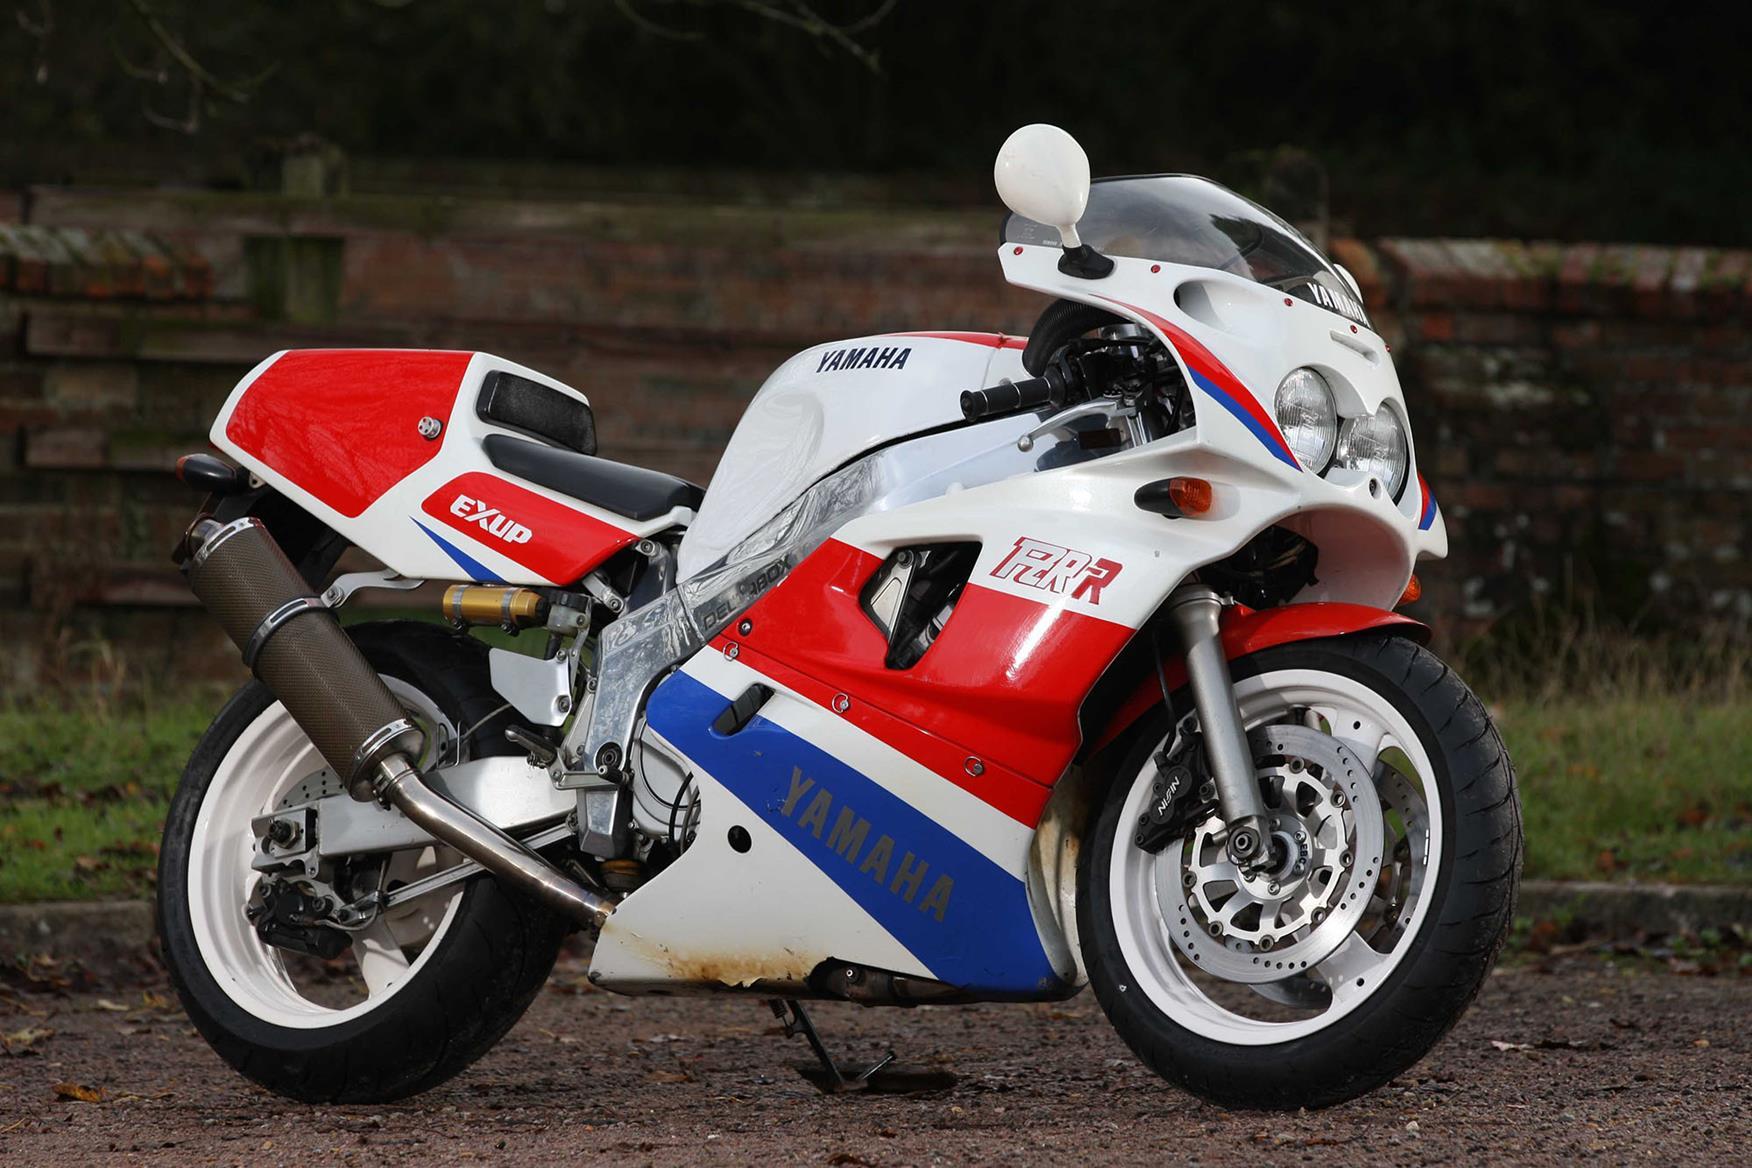 Yamaha OW-01 racebike conversion